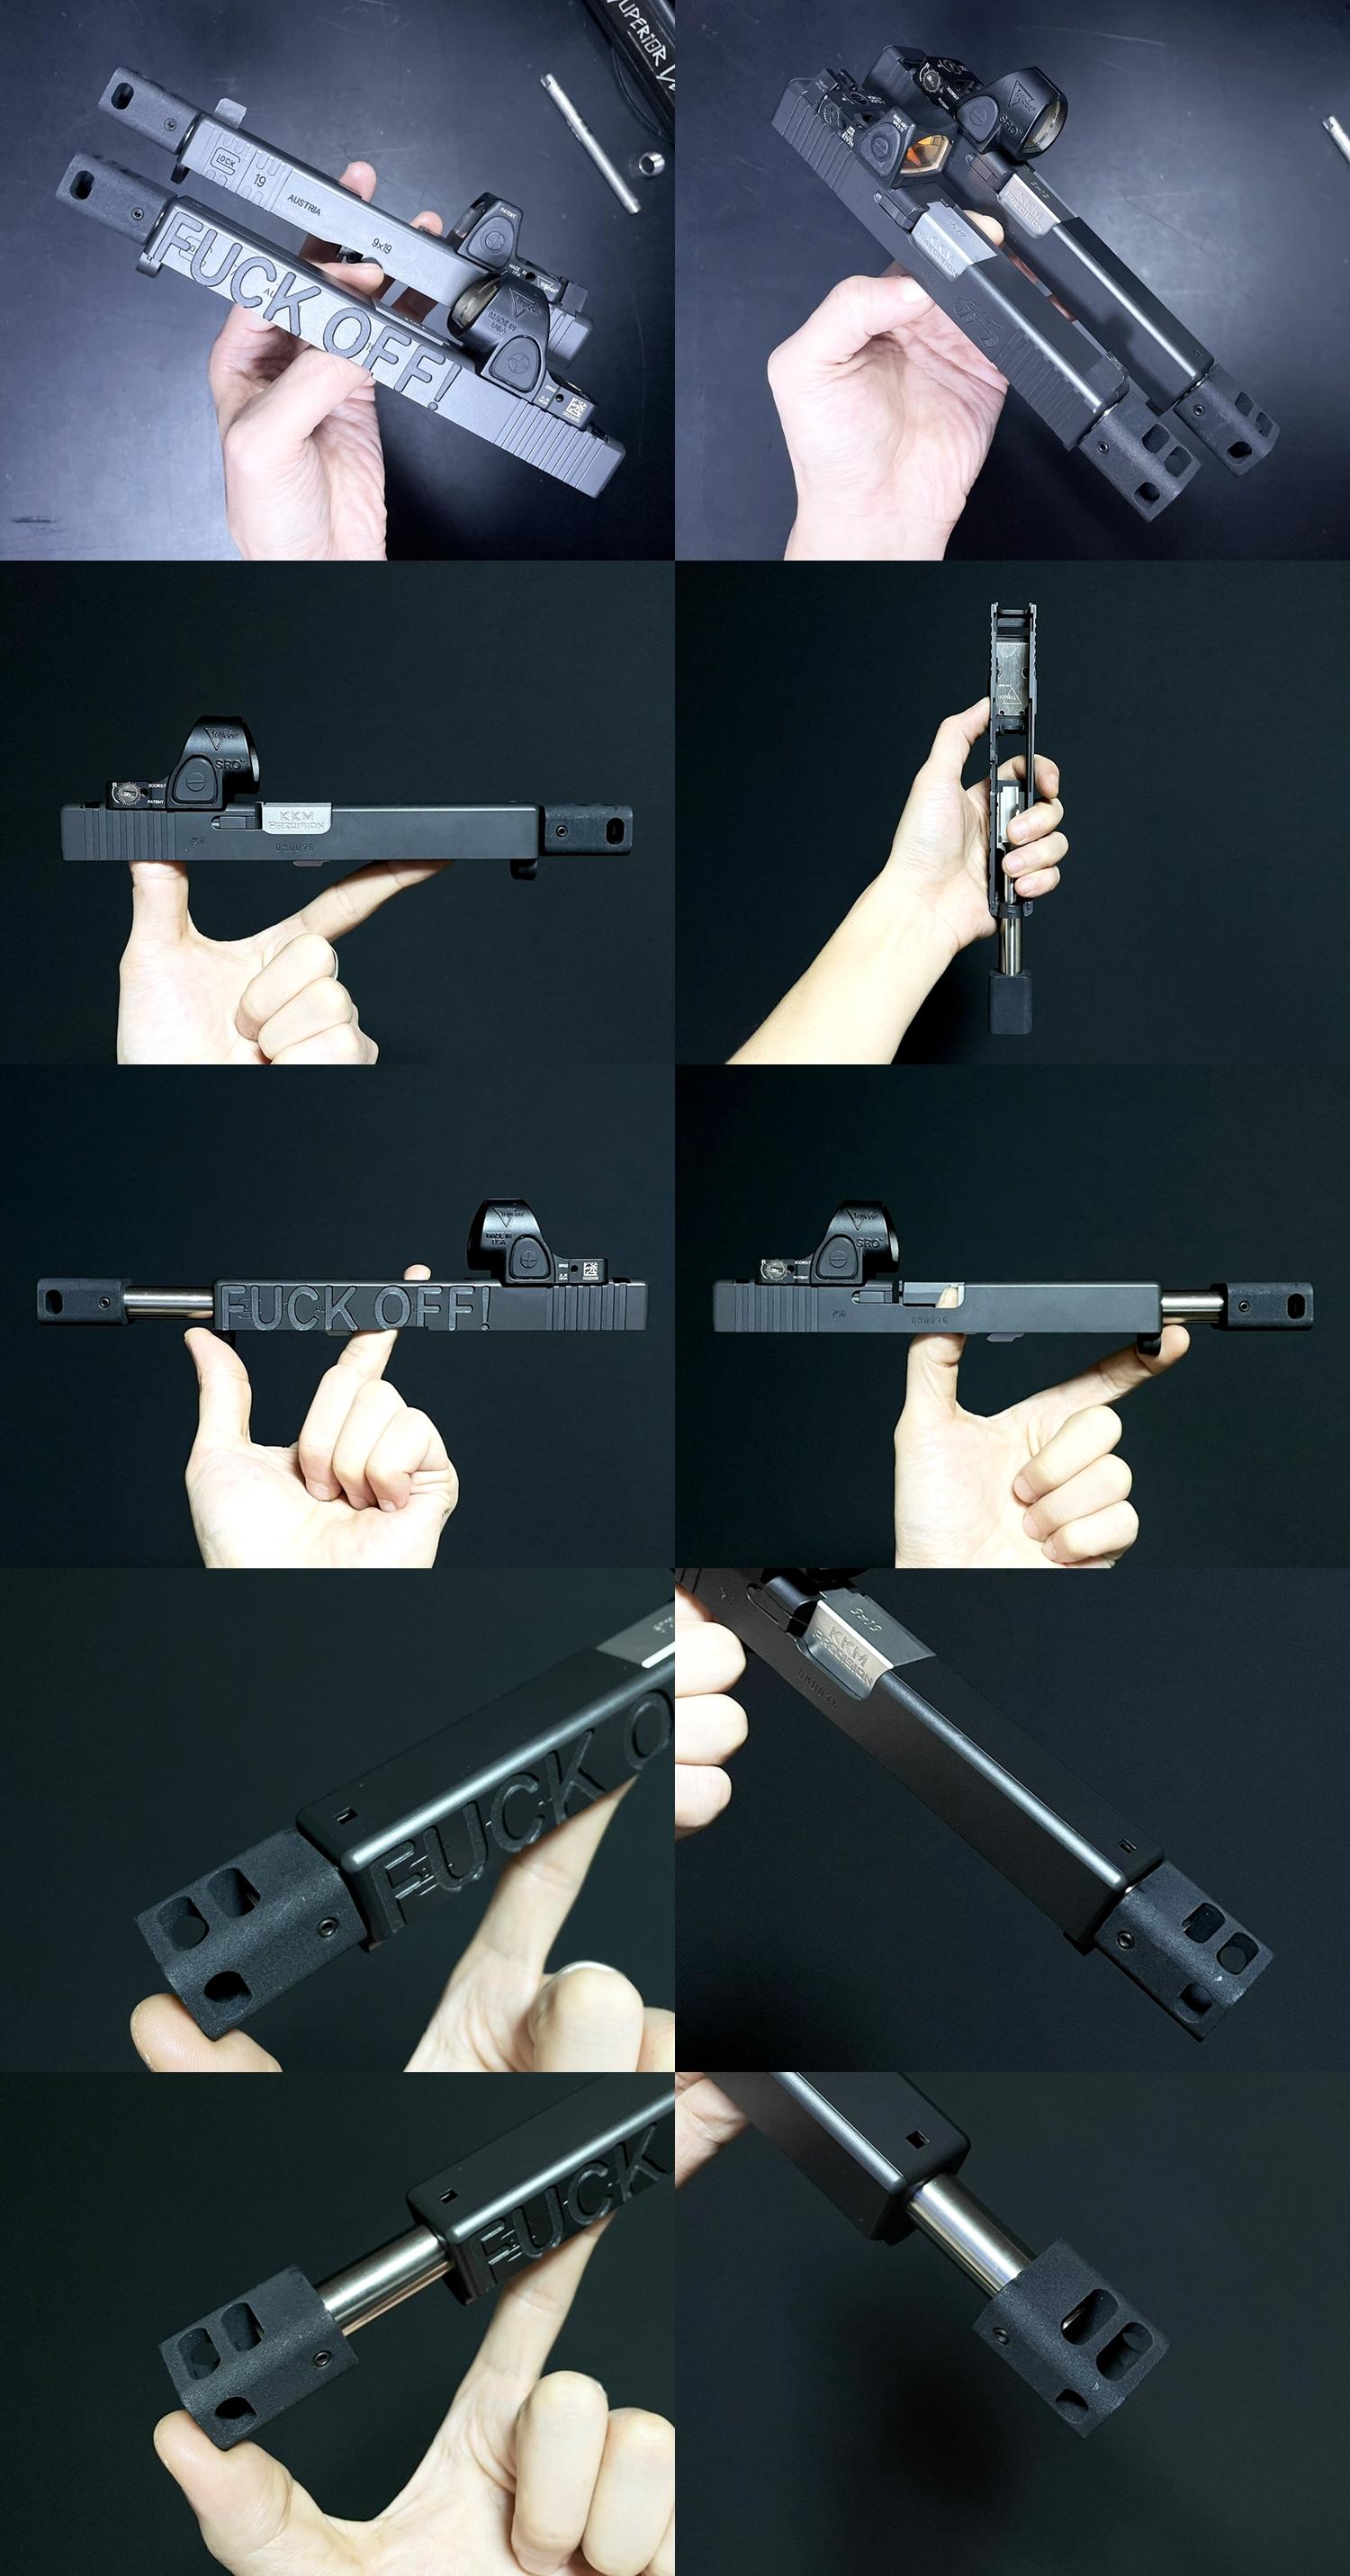 12 Guns Modify KKM PRECISION GLOCK ステンレスアウターバレル 東京マルイ G17 G18C GBB GET! リアルで重量感あるCNC 精密切り出し加工! BARREL+PROTECTOR+ショートリコイルアシストスプリング+インナーバレルセッ